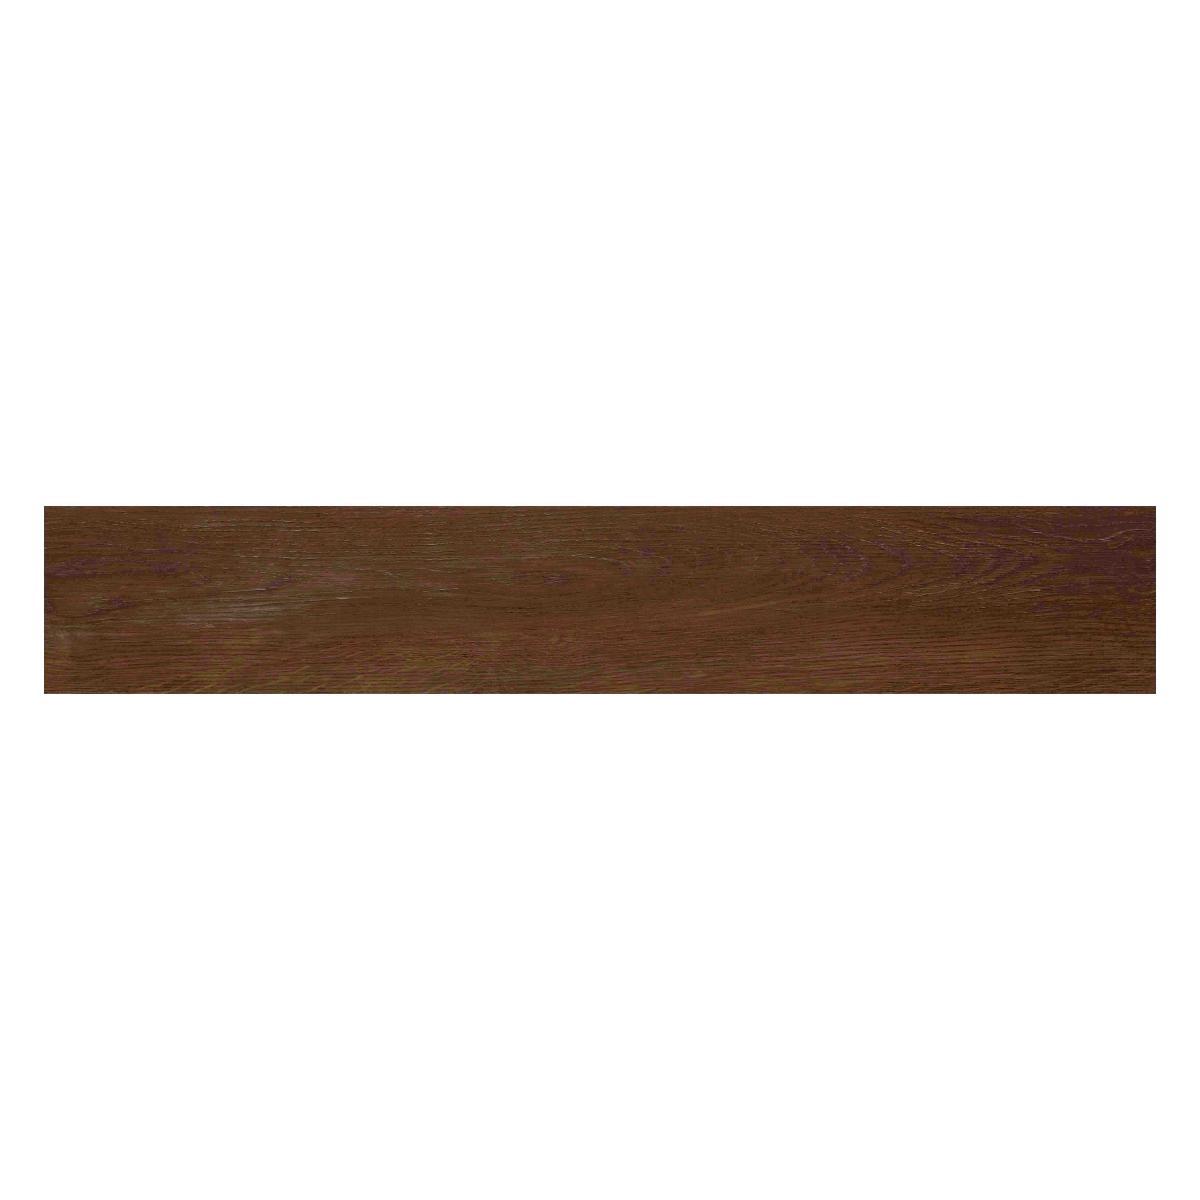 Piso PVC Manhattan Roble Manchester Mate - 18.4X12.2 - 2.24 m2